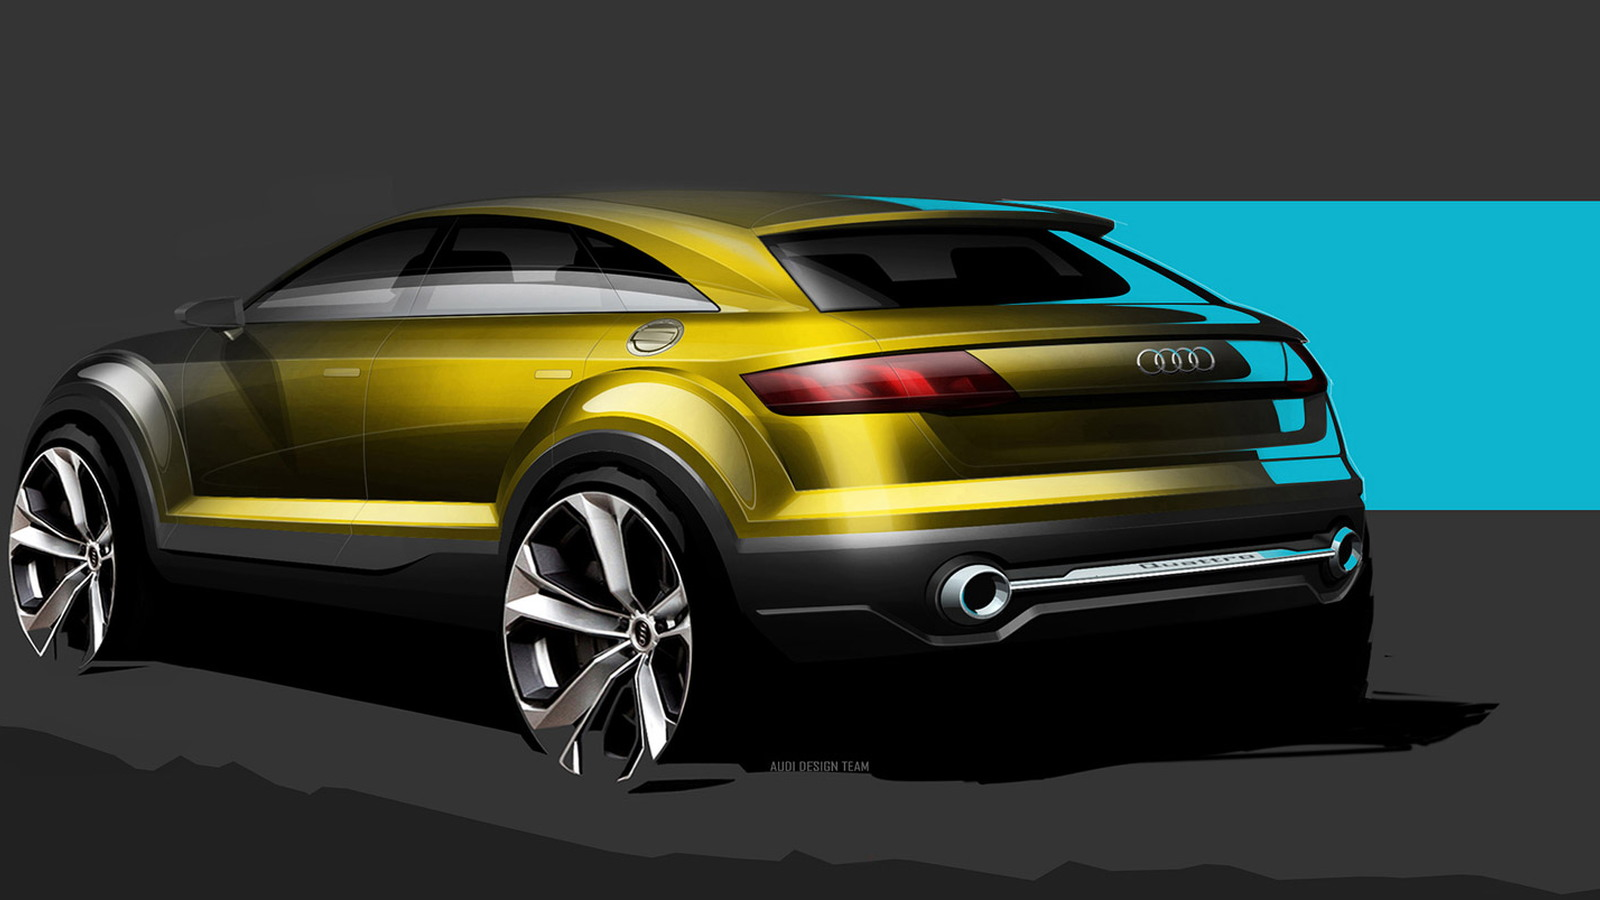 Teaser sketch for new Audi TT-based crossover concept